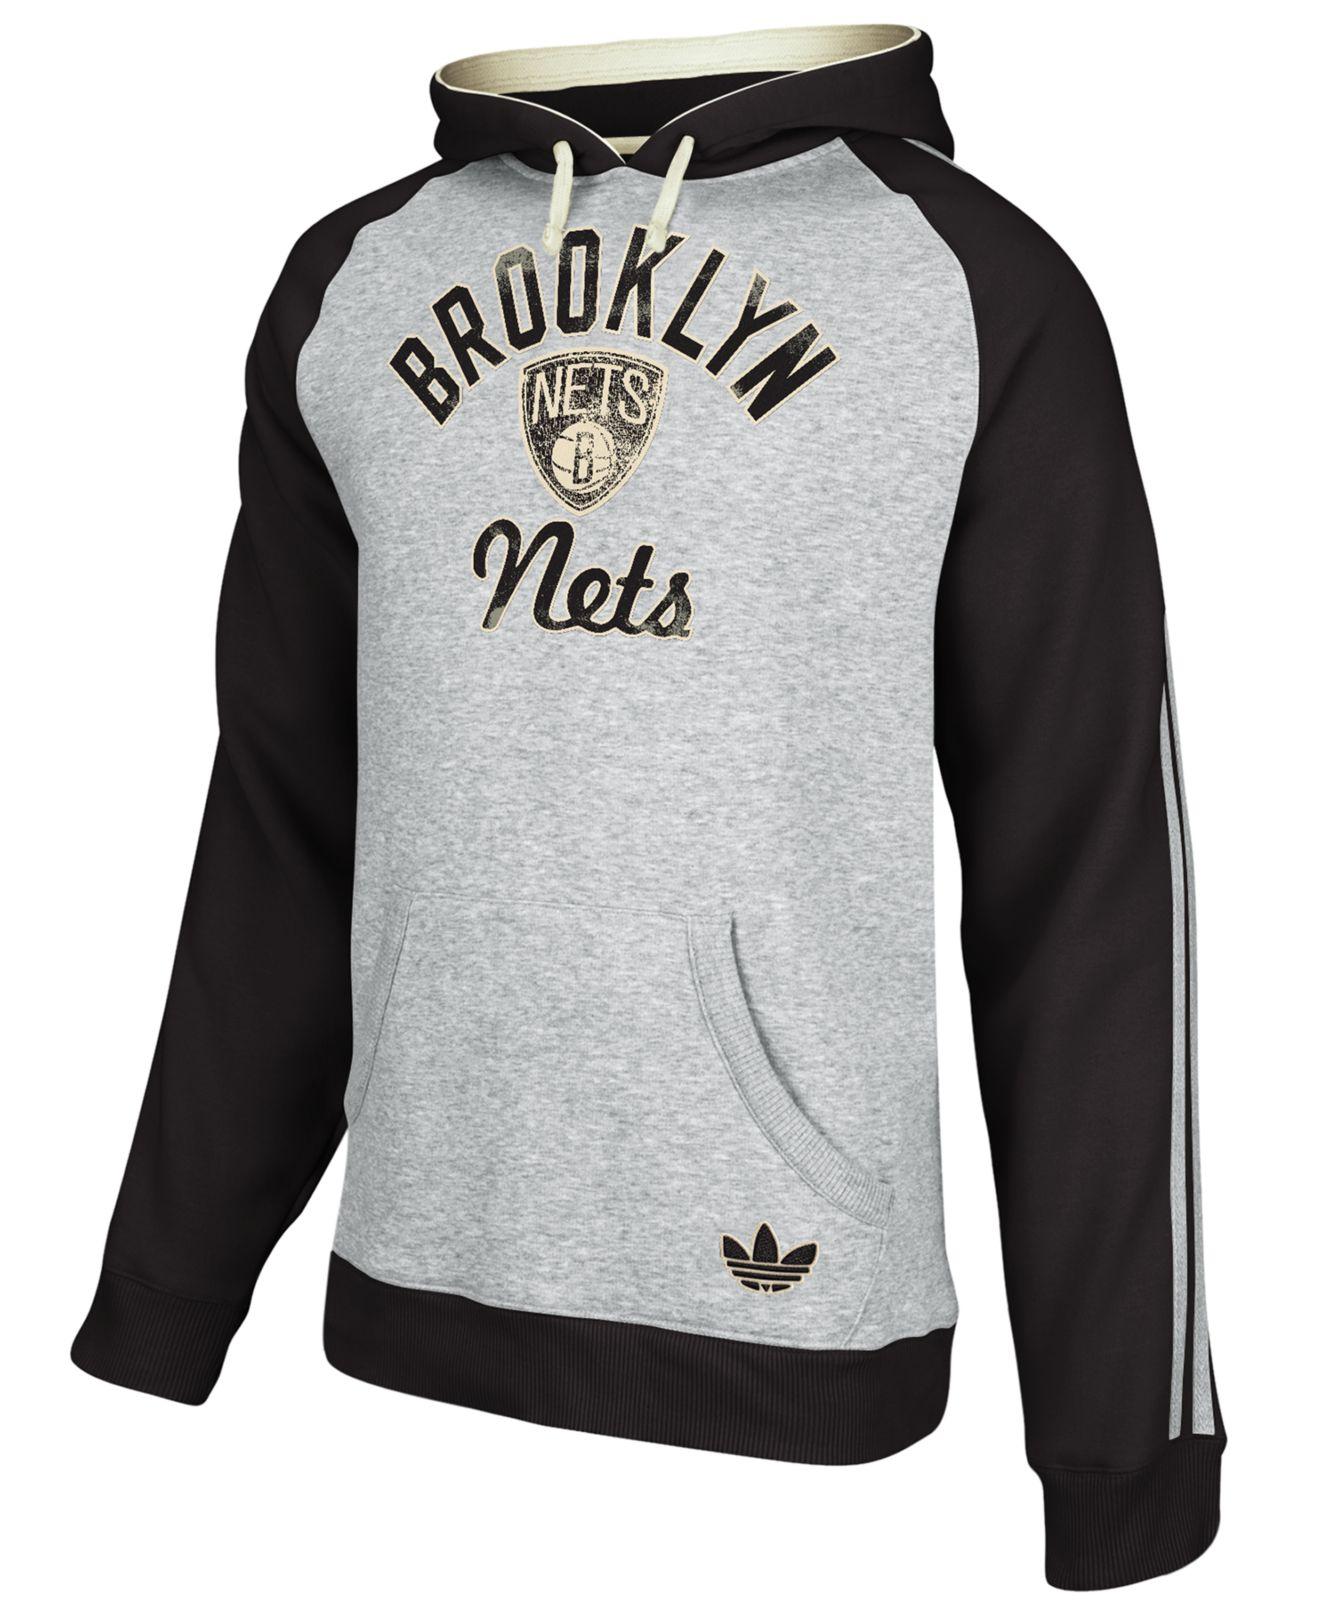 56919ae2e1f9 Lyst - adidas Men s Originals Nba Brooklyn Nets Hoodie in Gray for Men